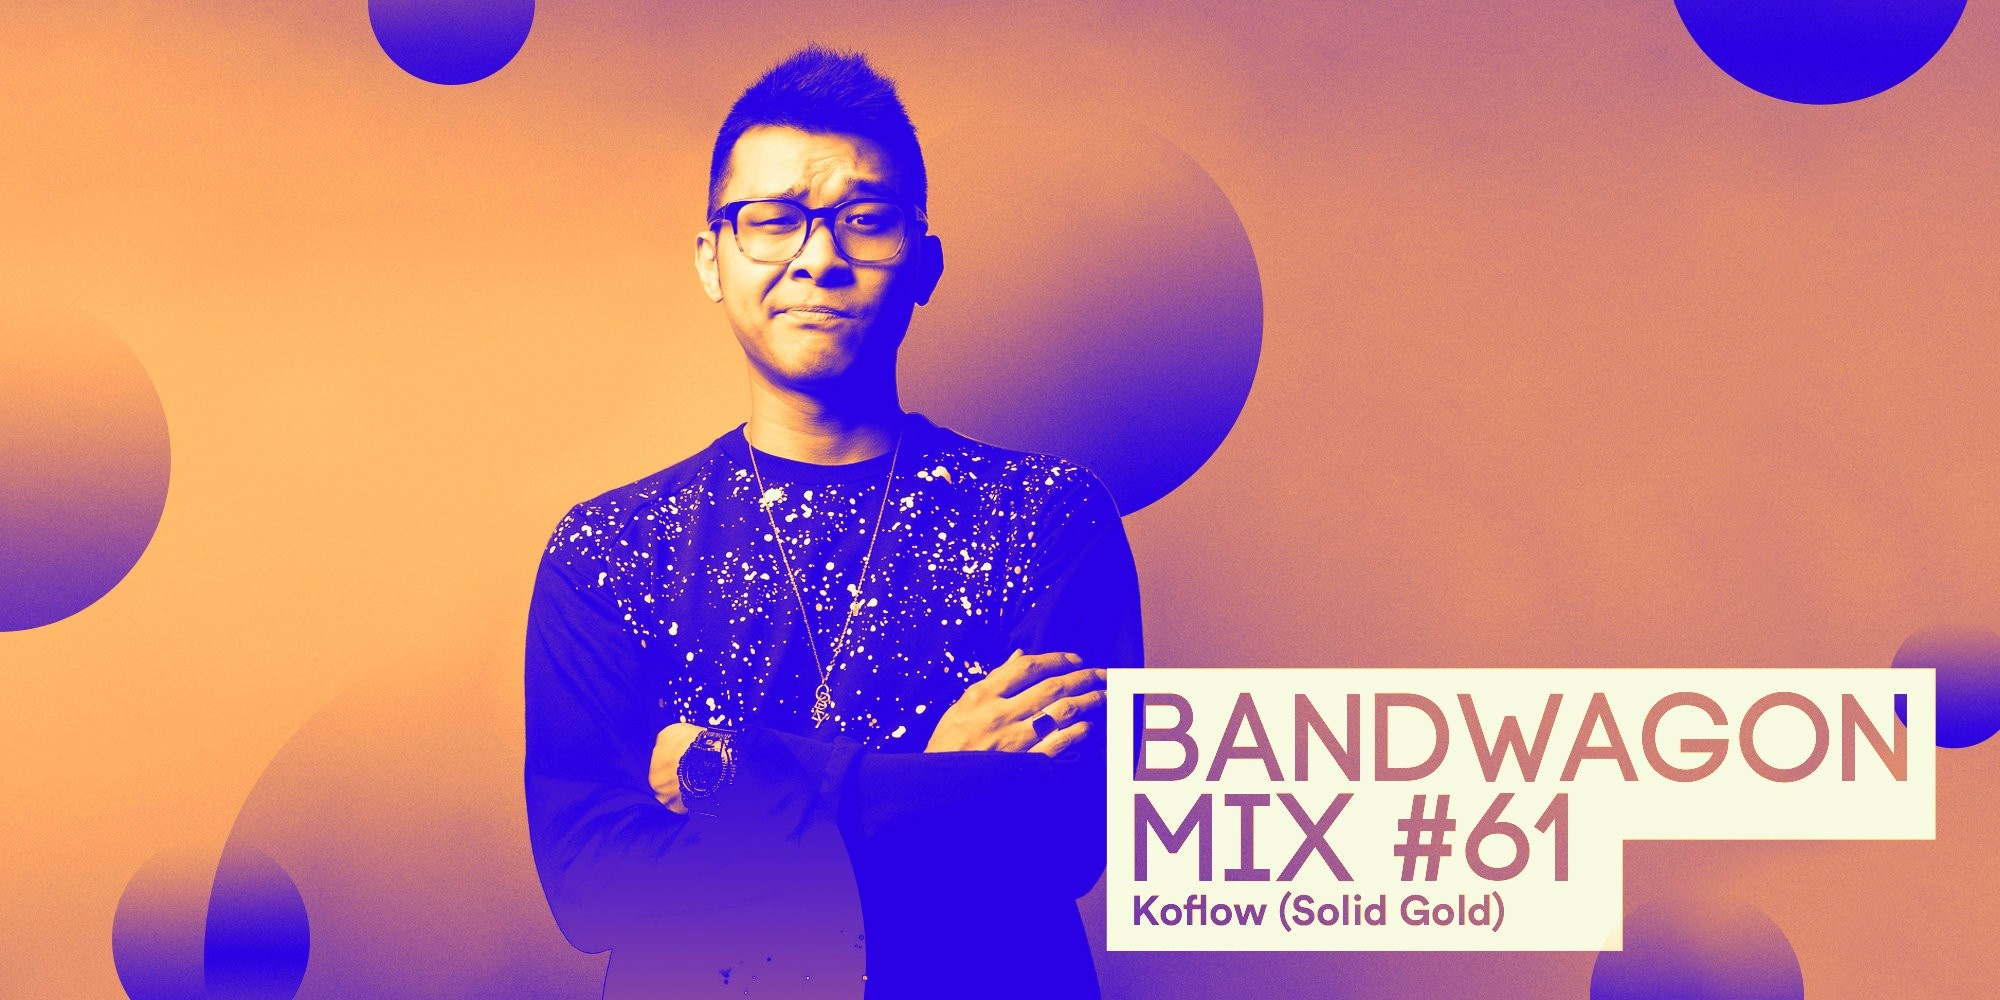 Bandwagon Mix #61: Koflow (Solid Gold)